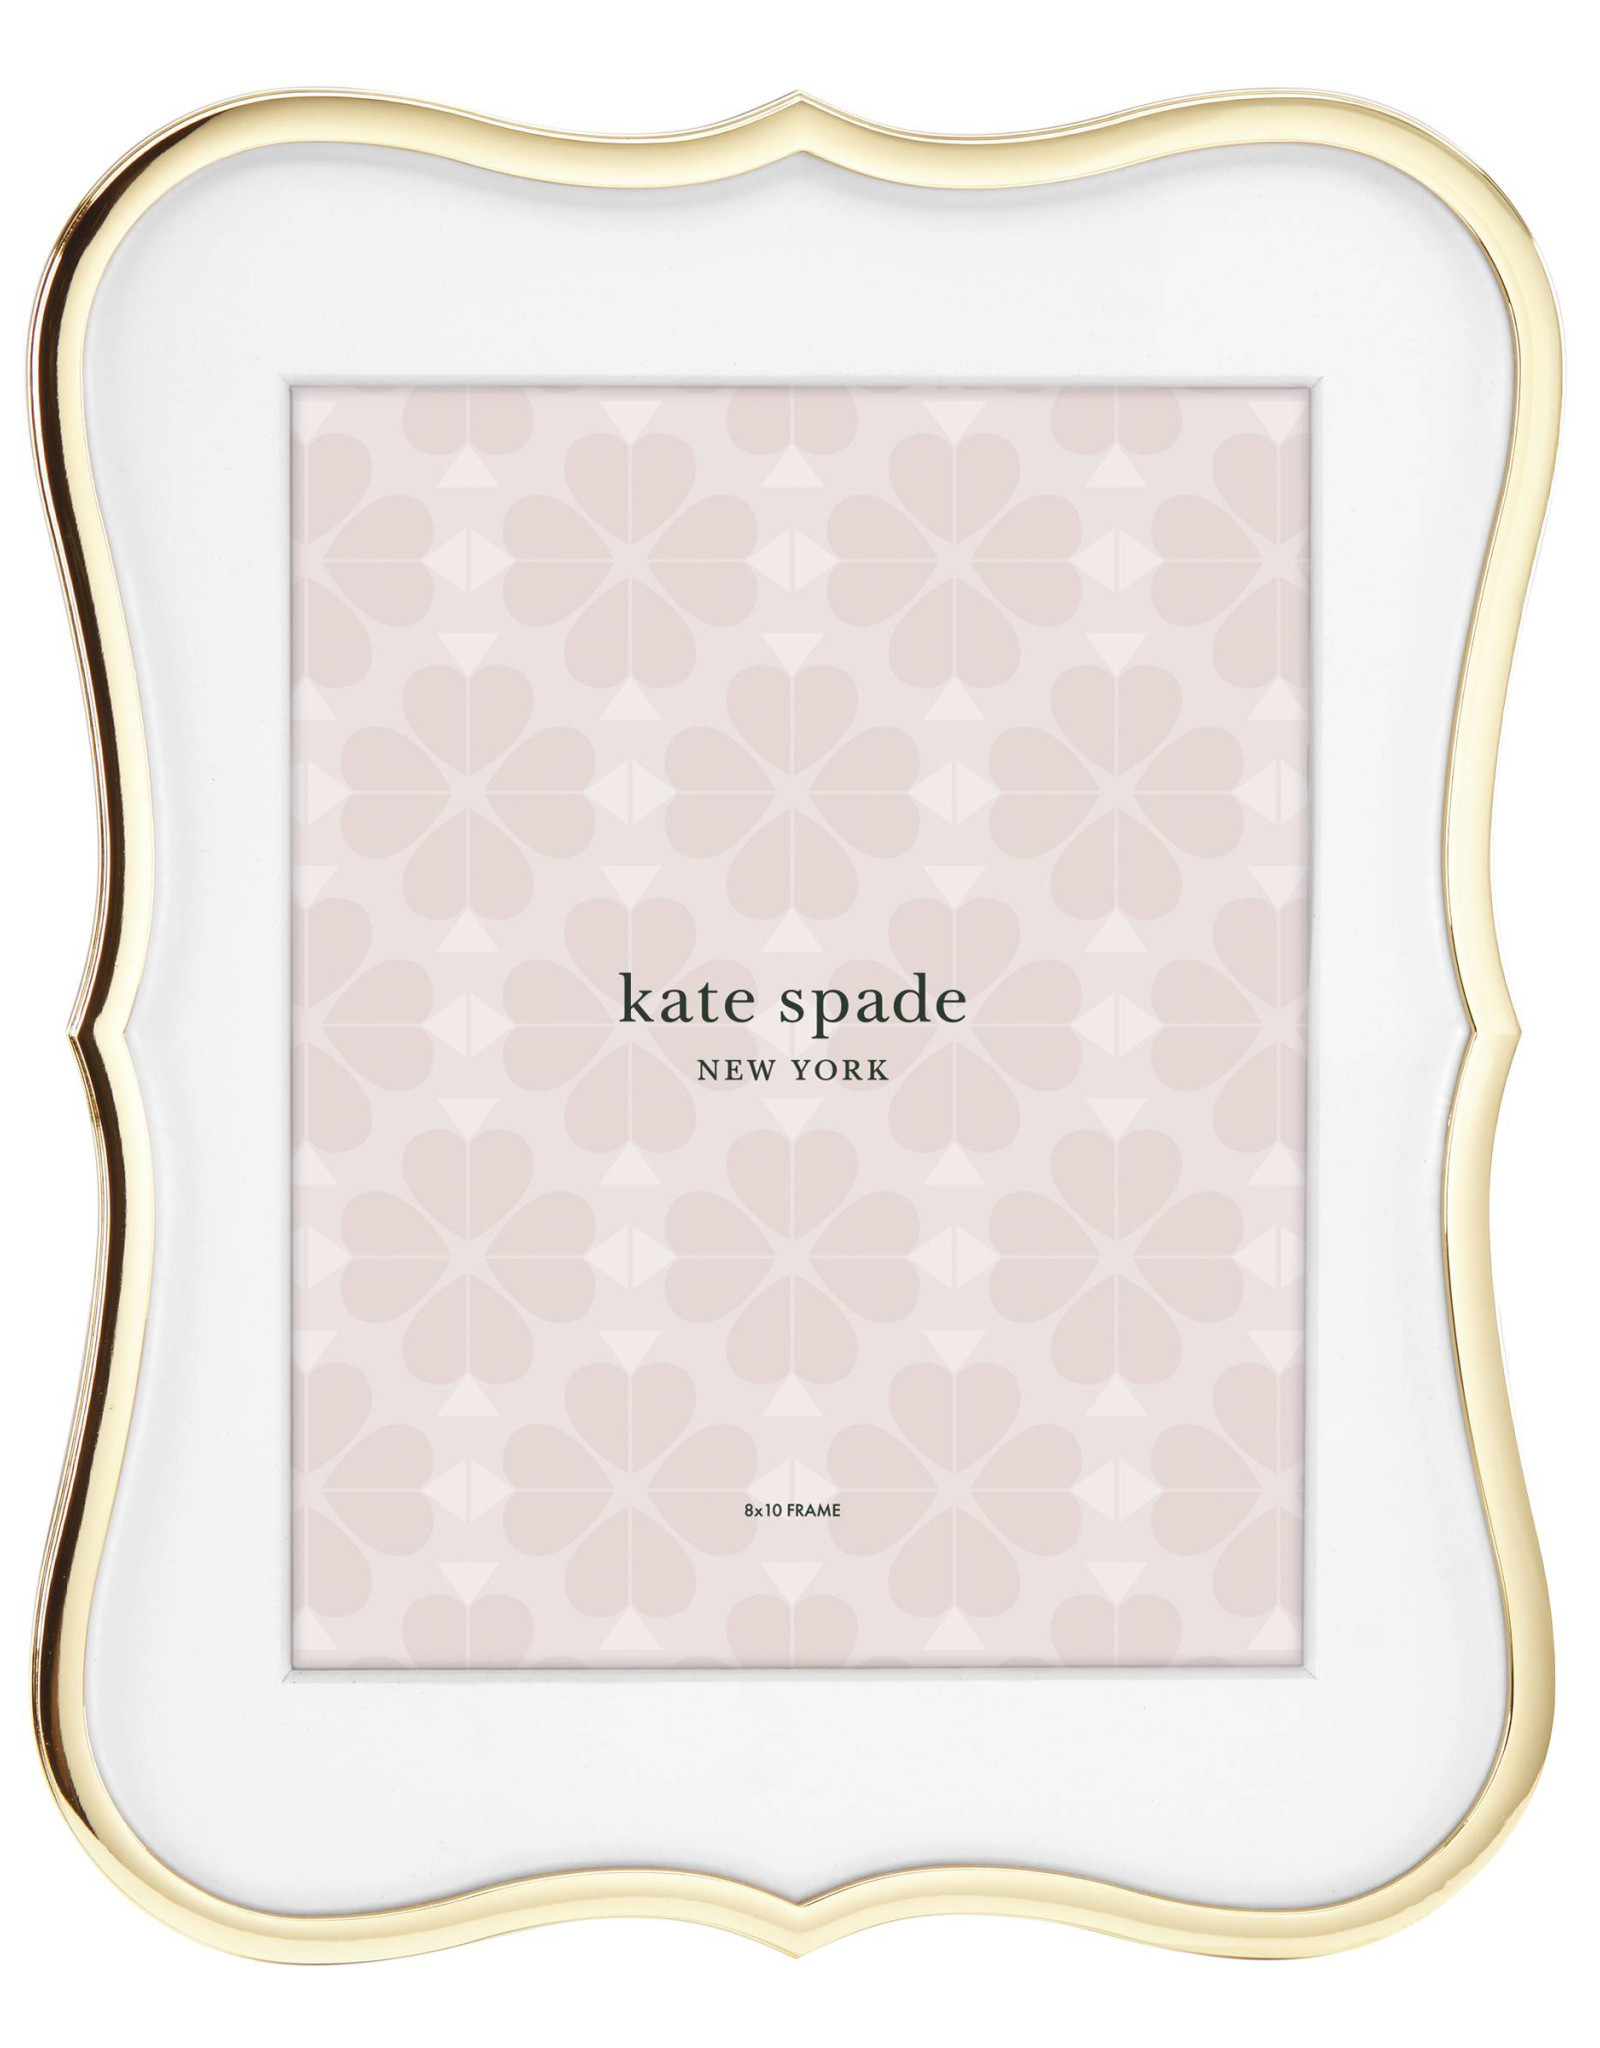 Kate Spade Crown gold frame 8x10